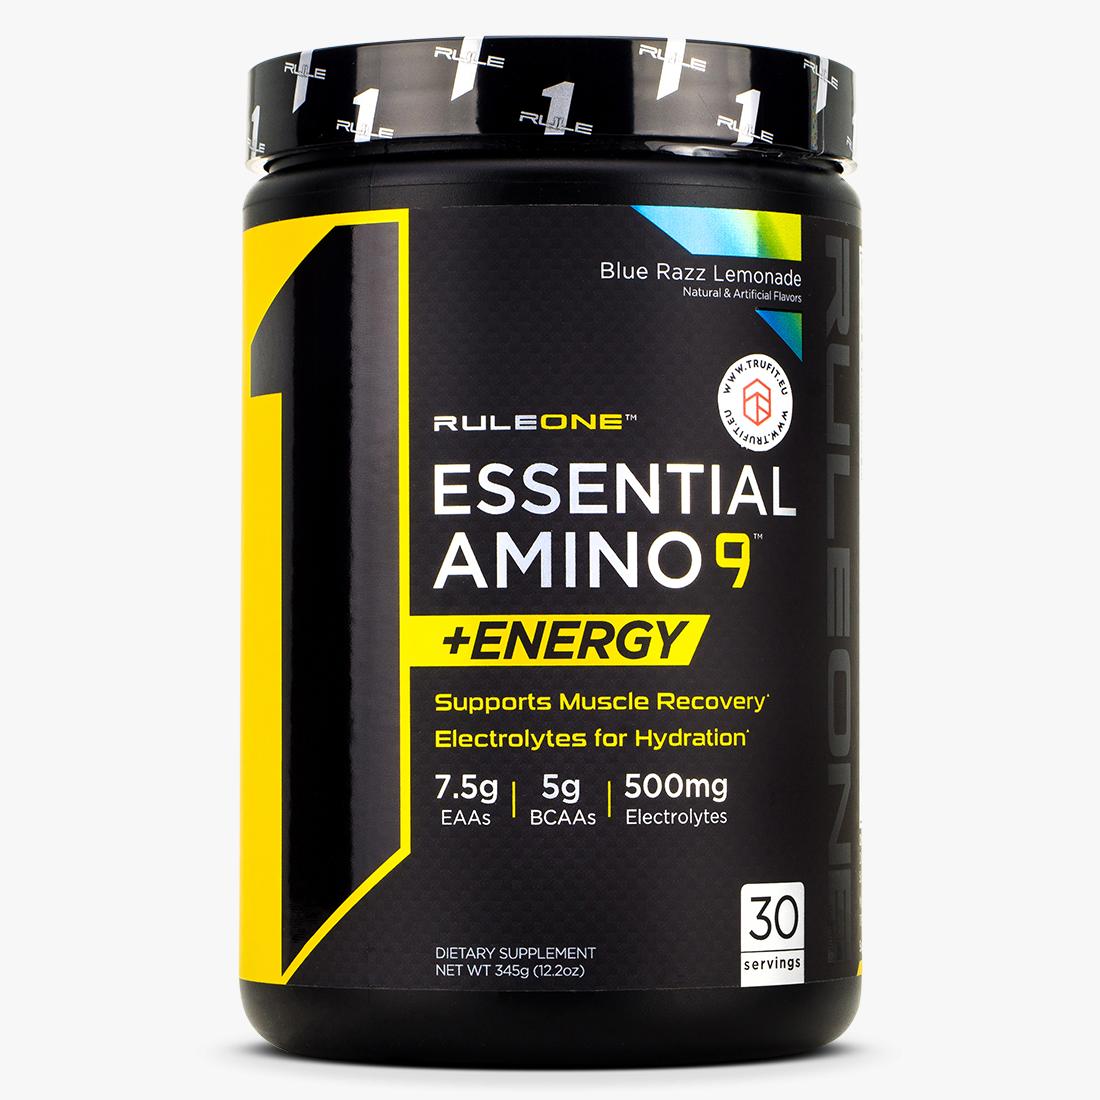 Rule 1 - R1 Essential Amino 9 Energy